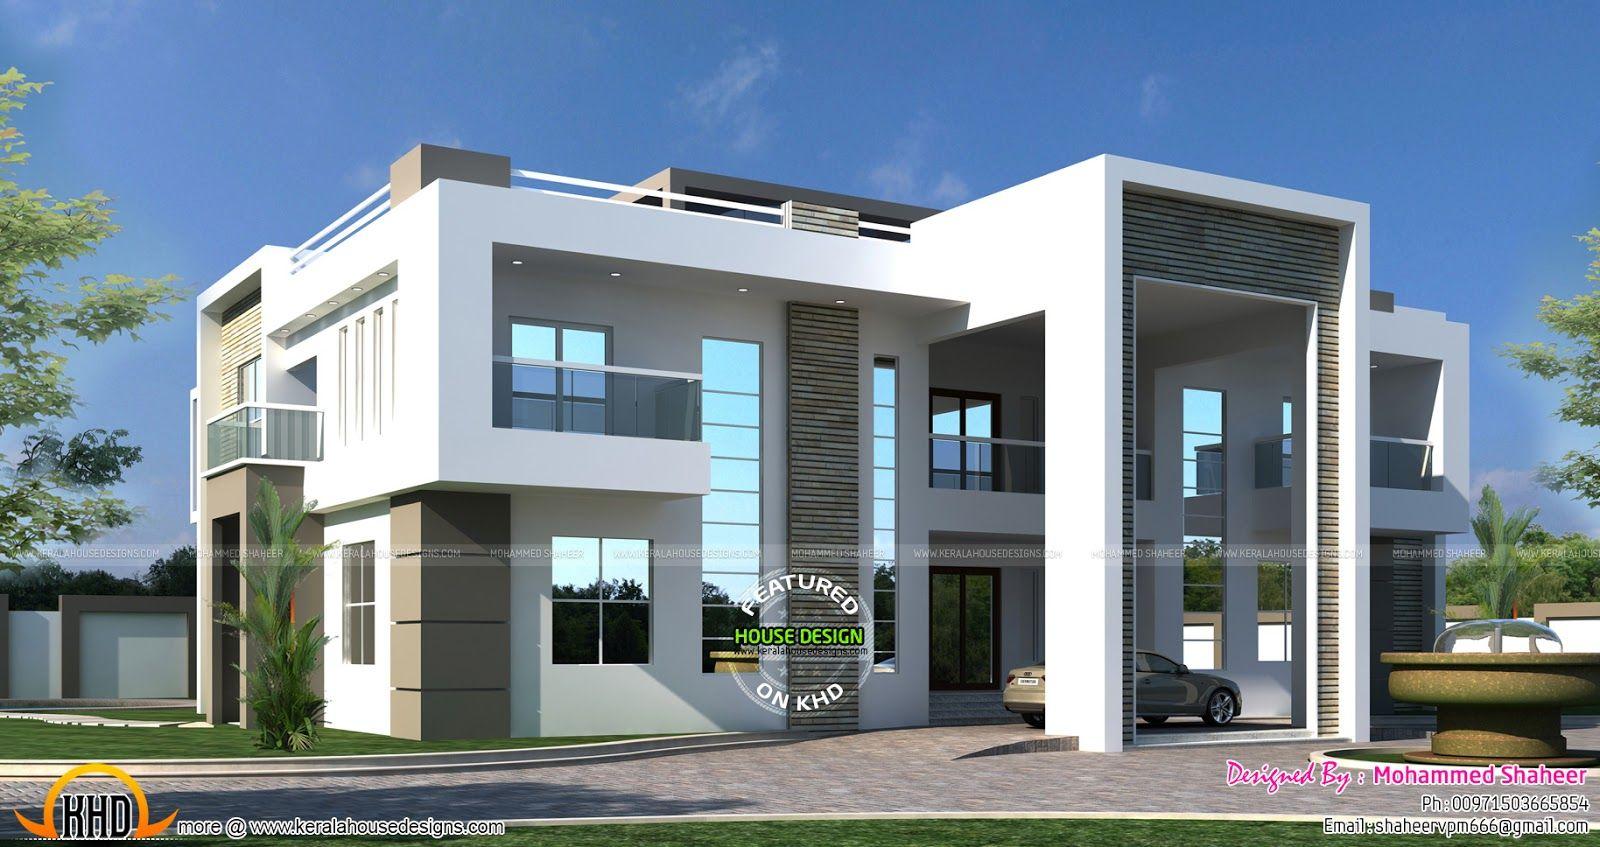 Flat Roof Arabian House Plan Kerala House Design Beautiful House Plans Architectural Design House Plans